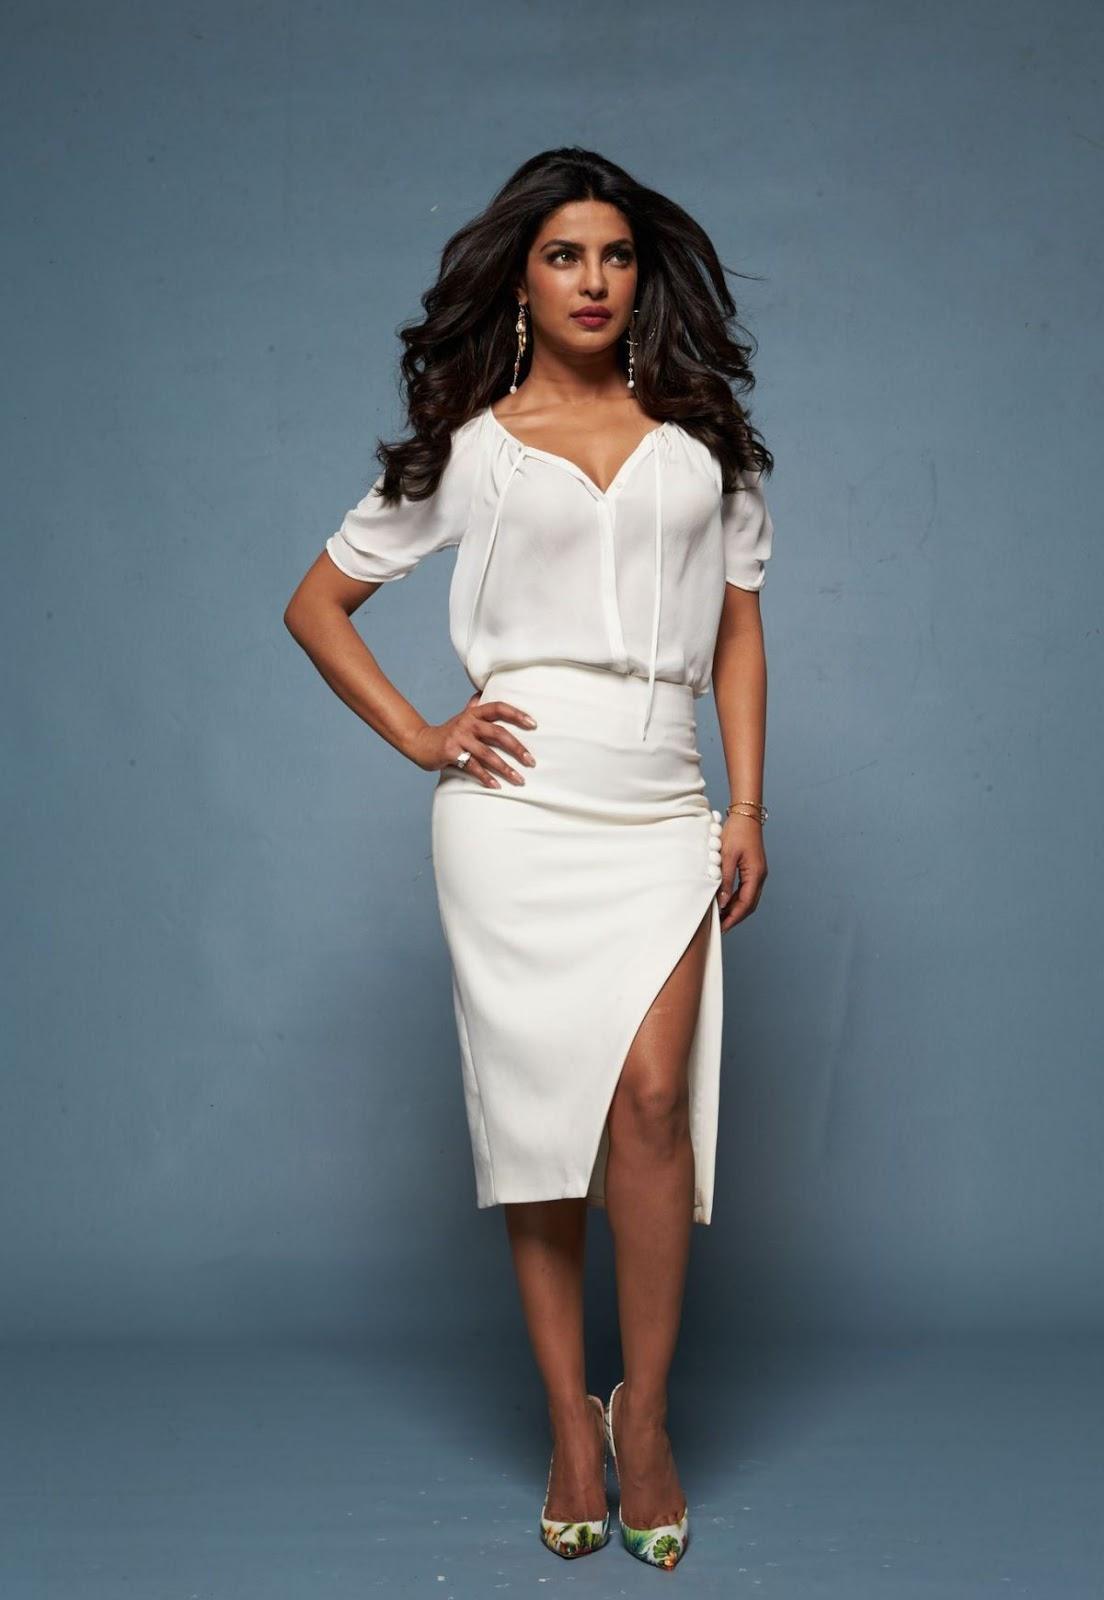 Priyanka Chopra Hot Boobs Show For Baywatch Promo  Krazy -4791